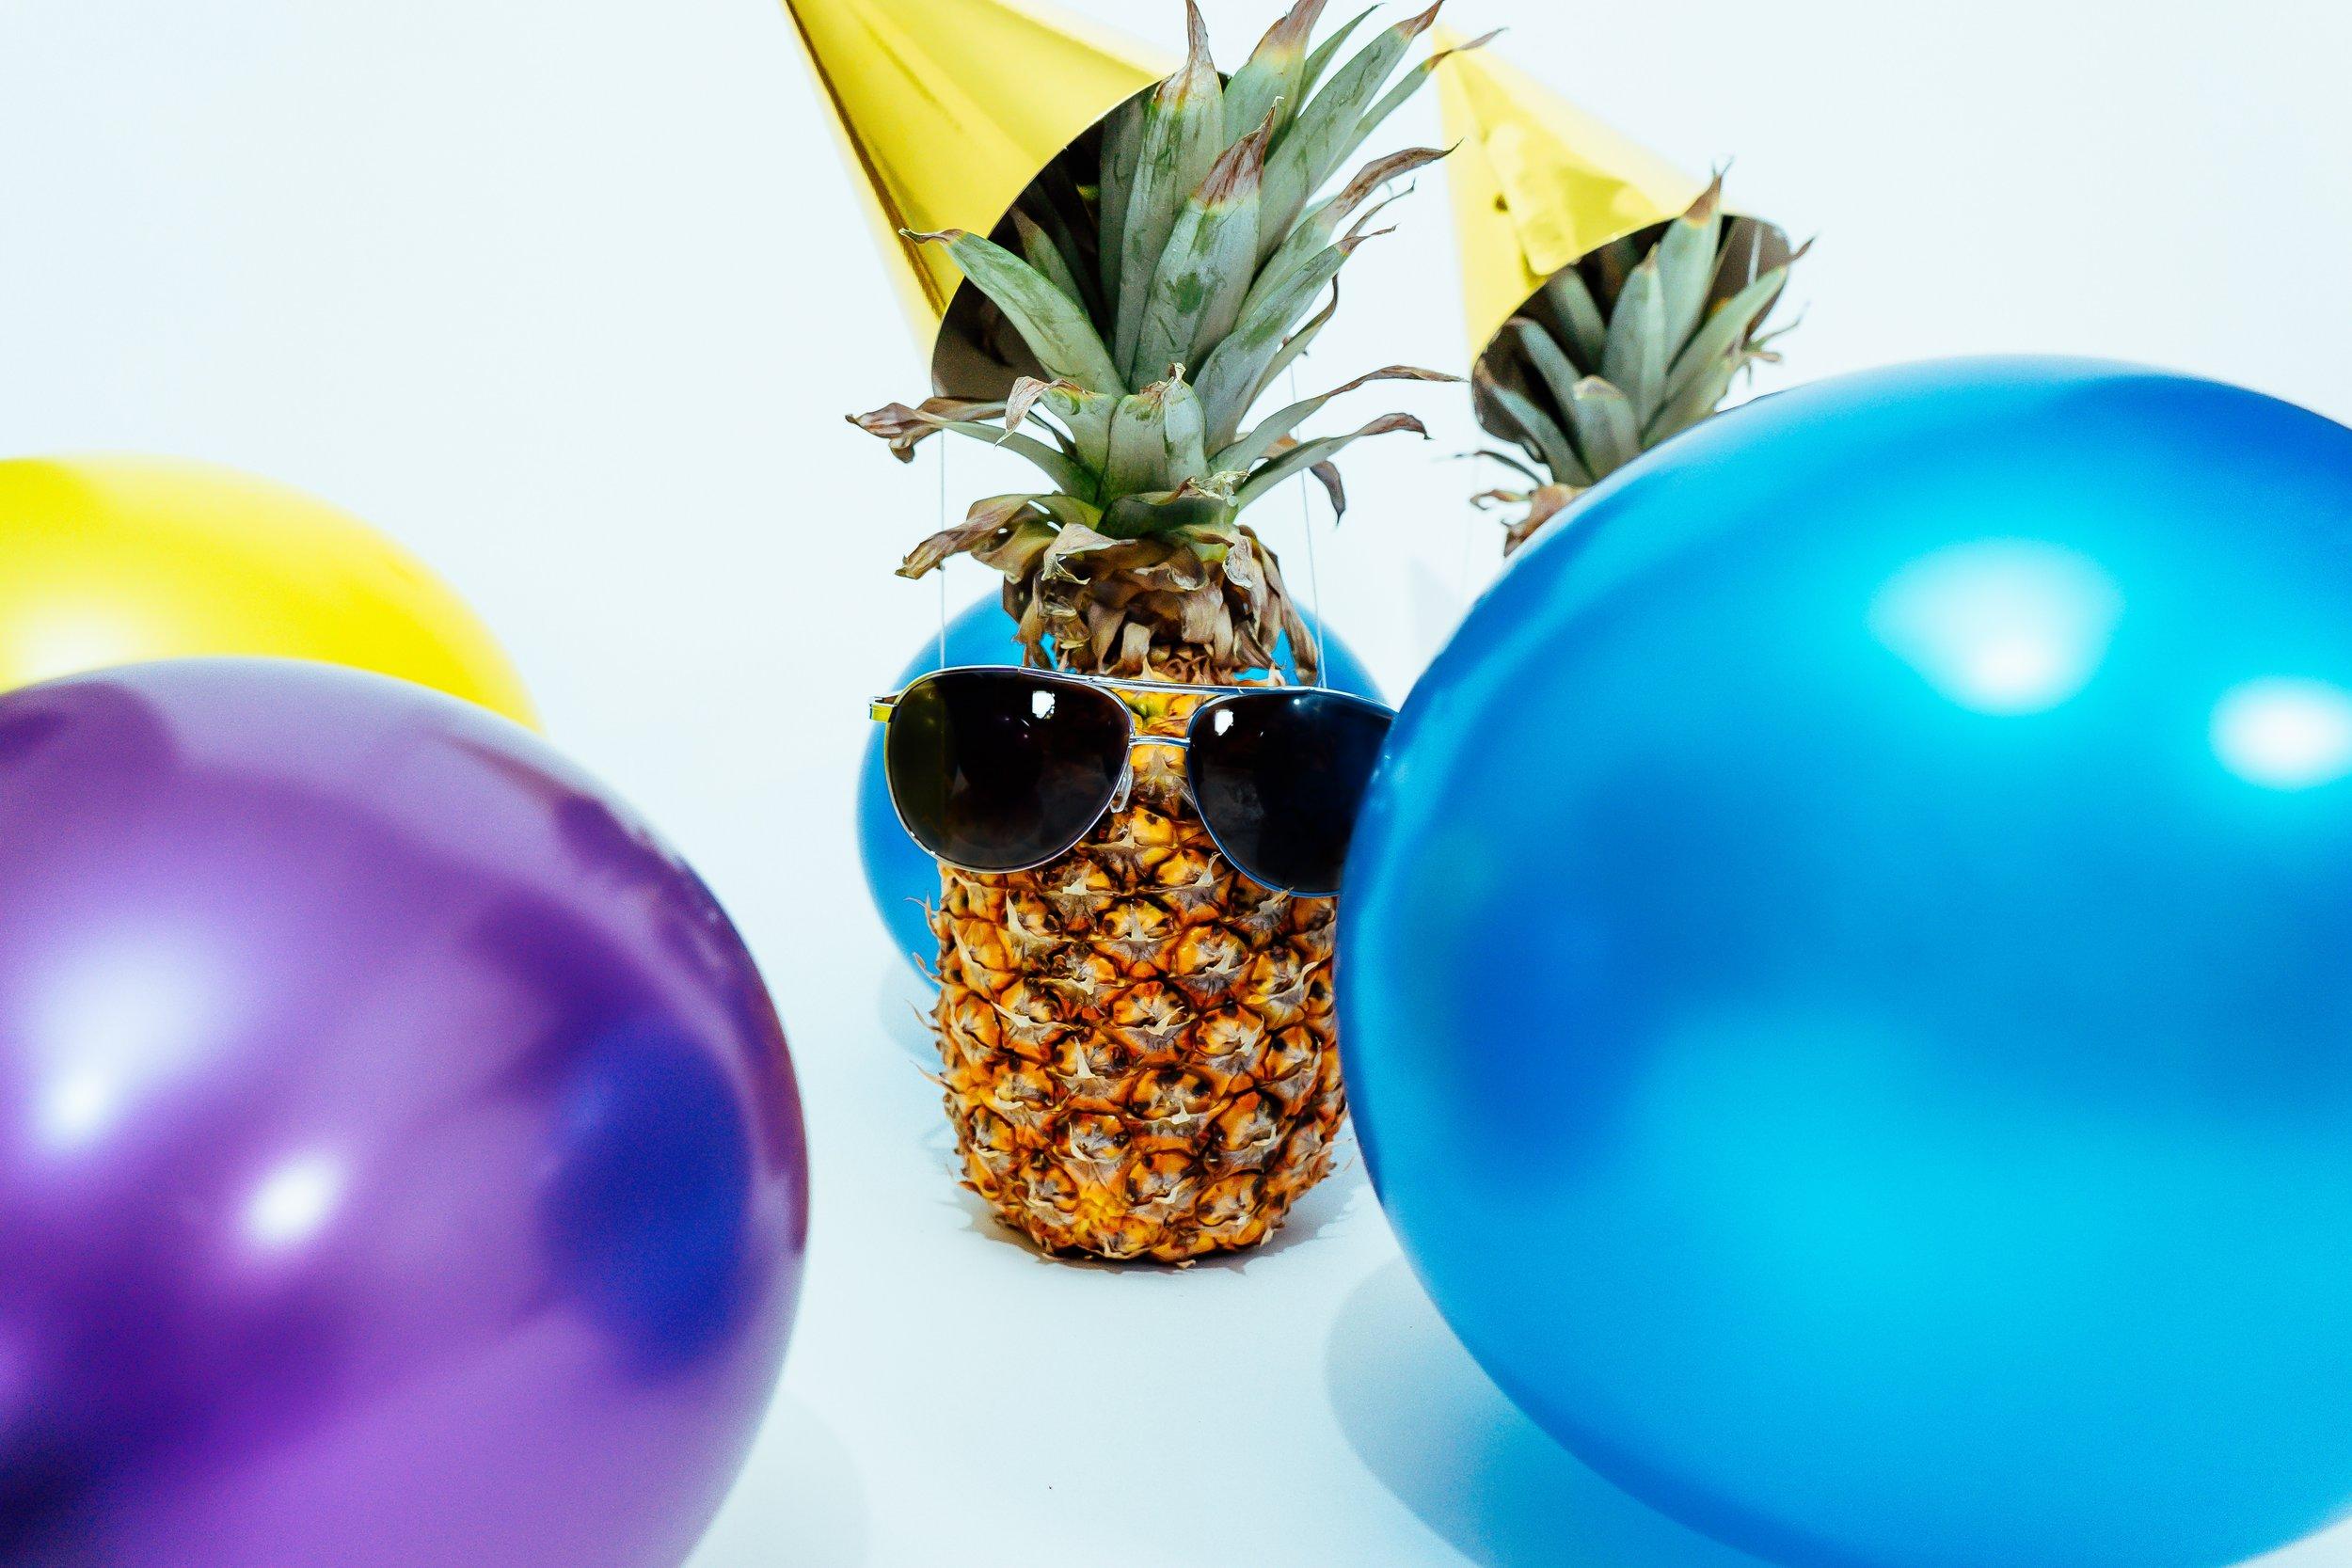 pineapple-supply-co-278187.jpg